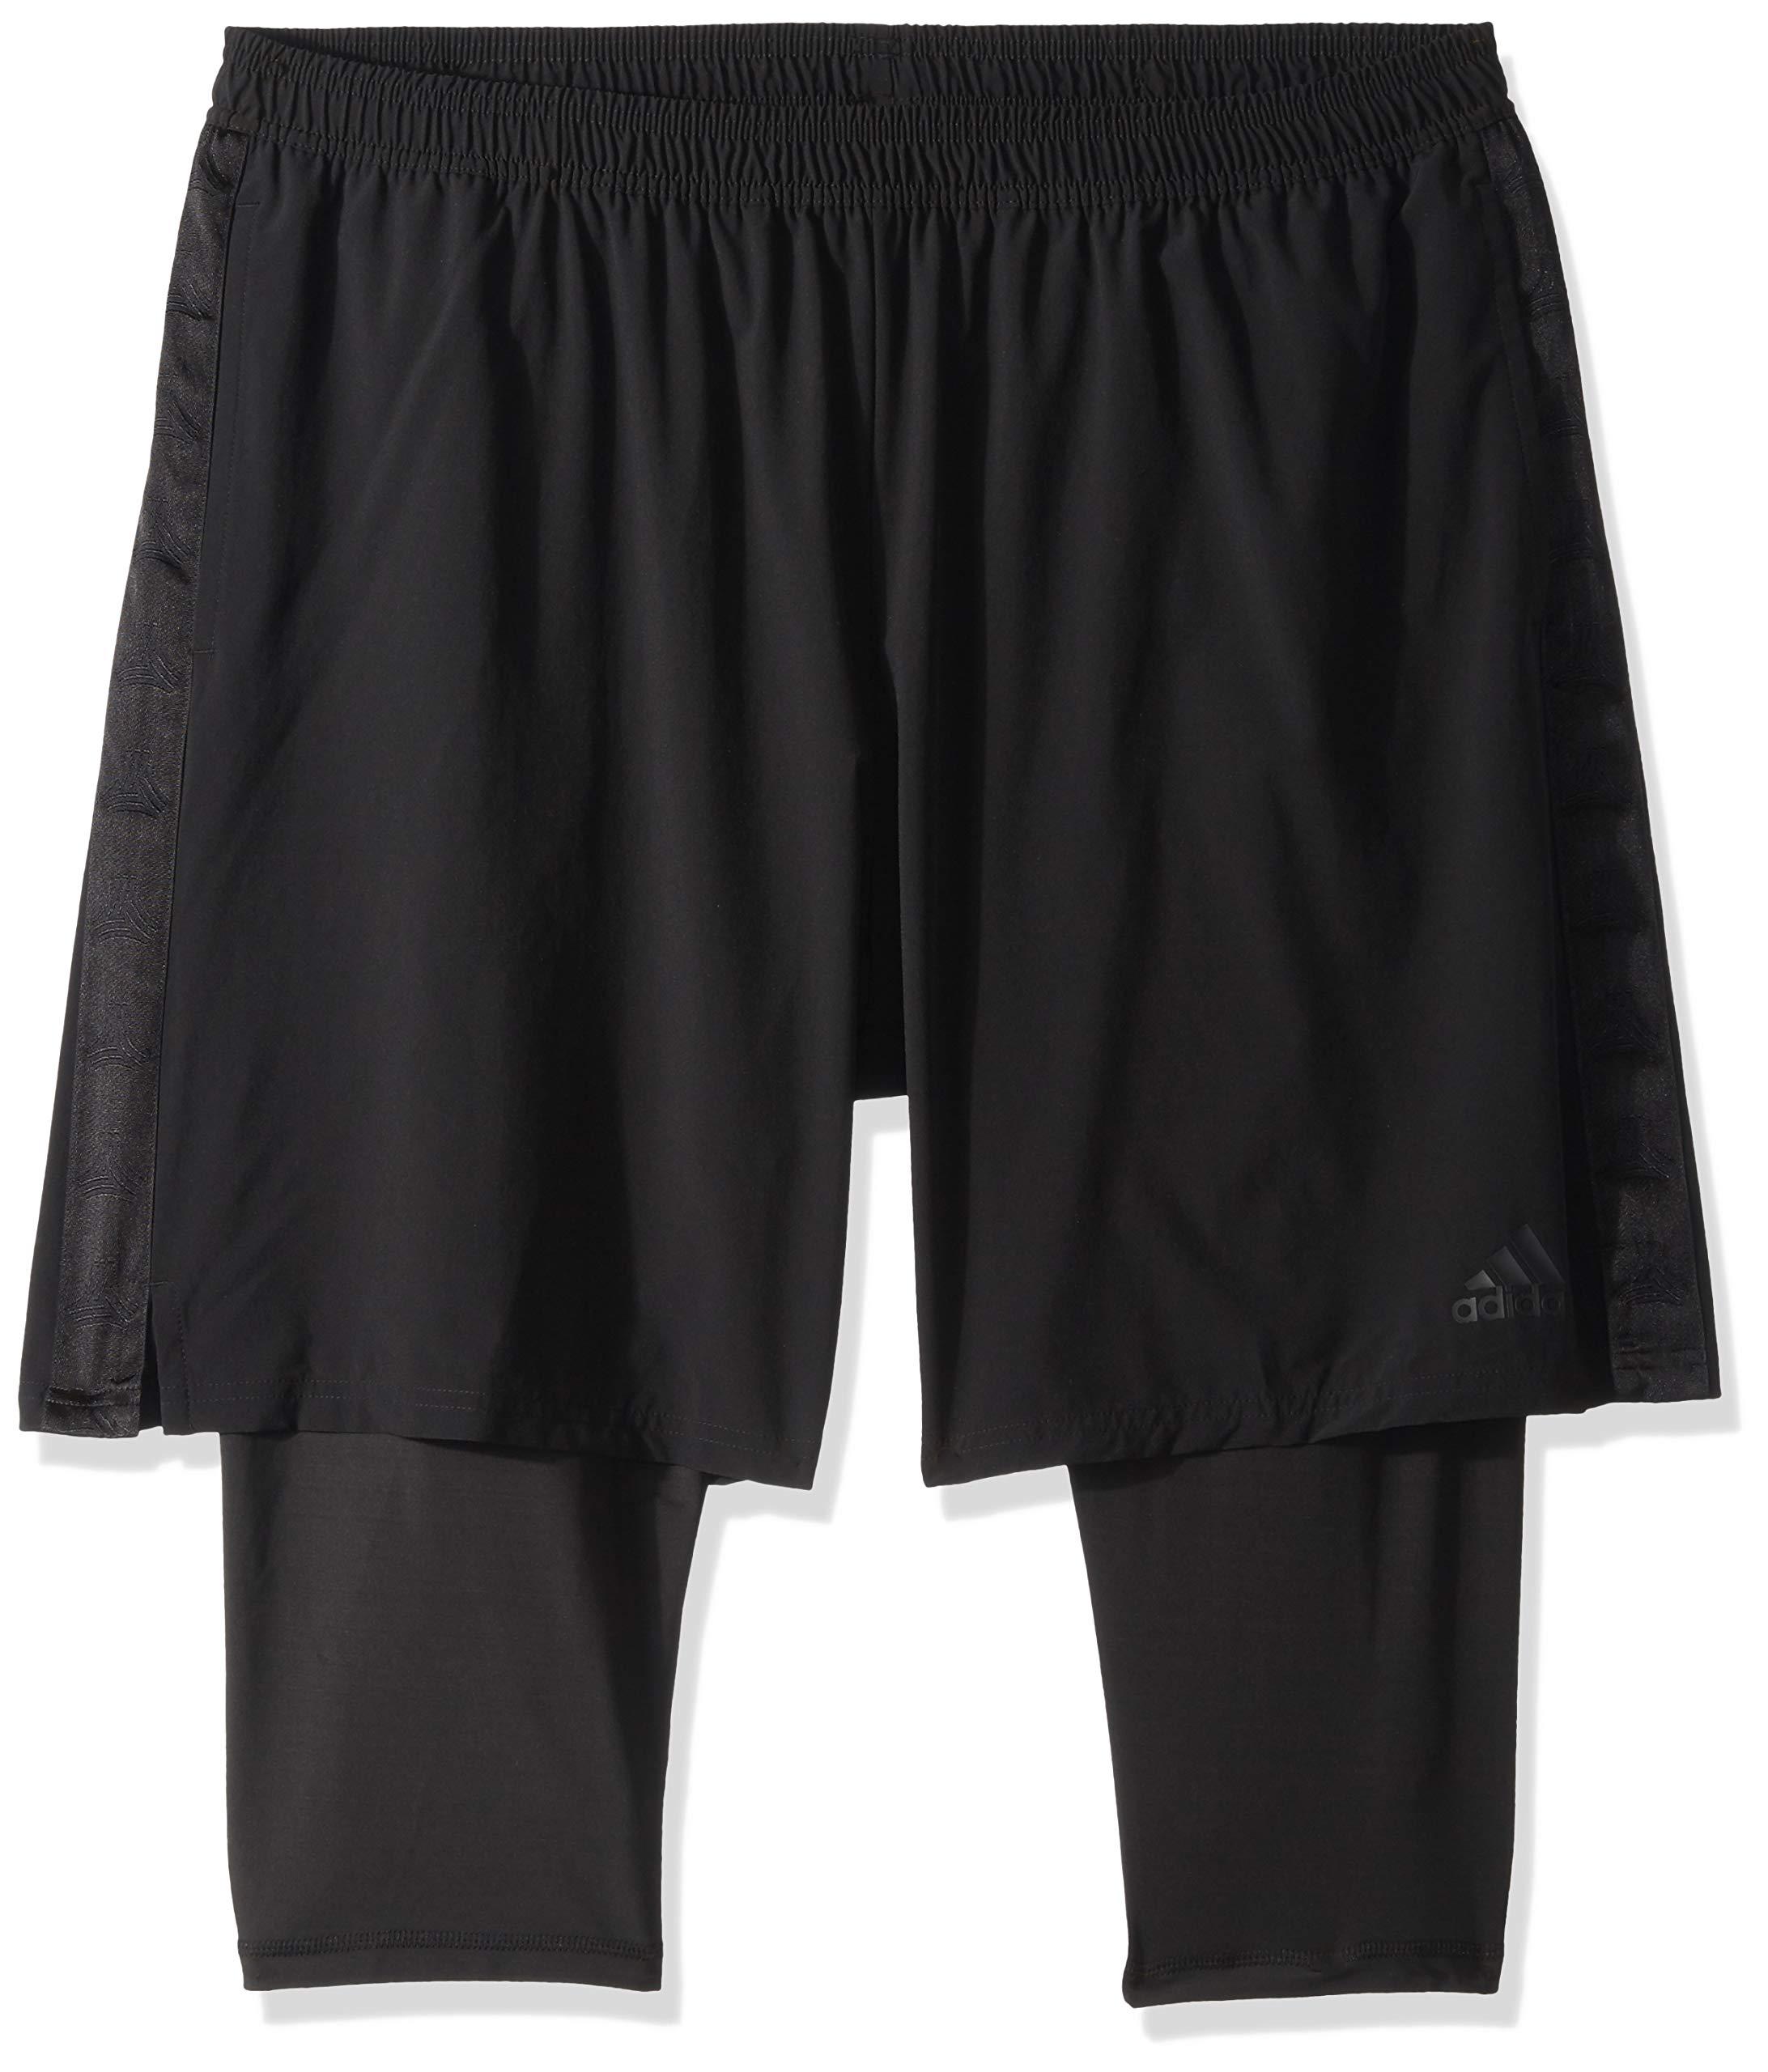 adidas Men's Soccer Tango Player 2-in-1 Short, Black, Medium by adidas